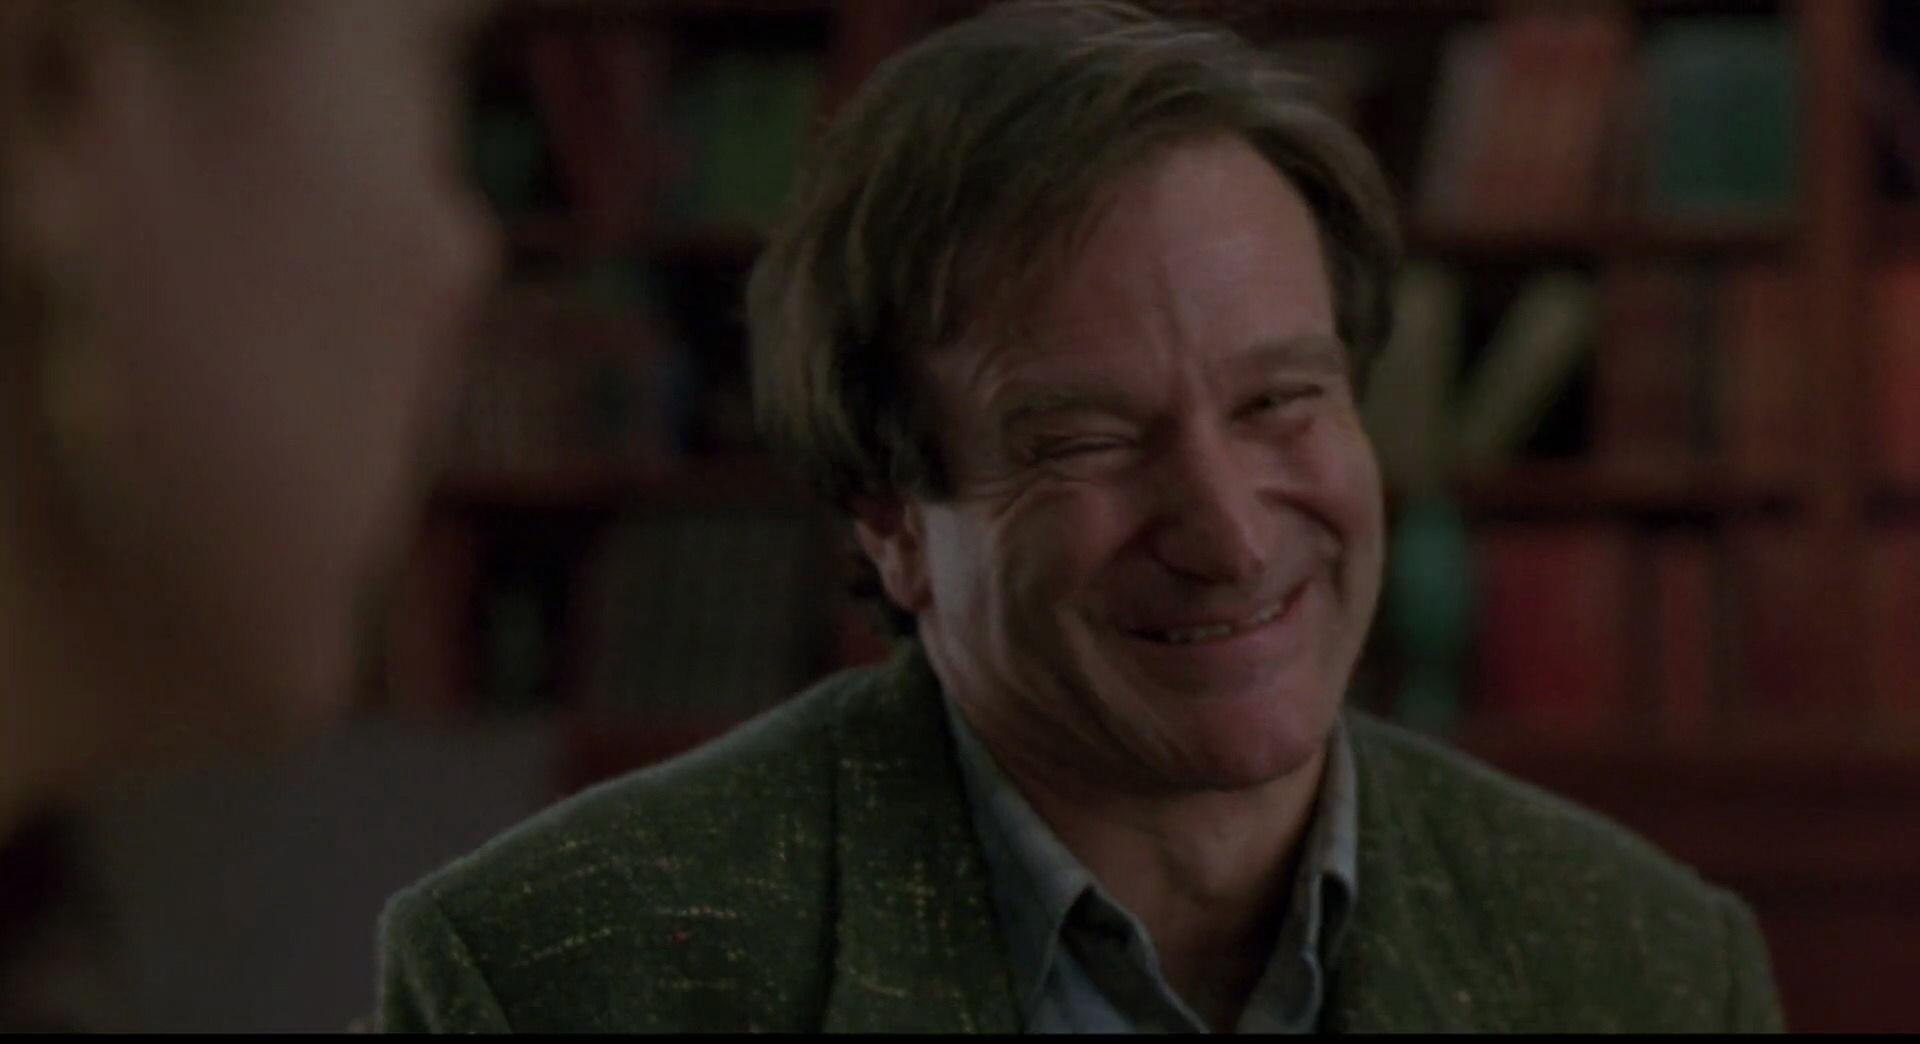 Robin In Jumanji - Robin Williams Fan Art (37487206) - Fanpop